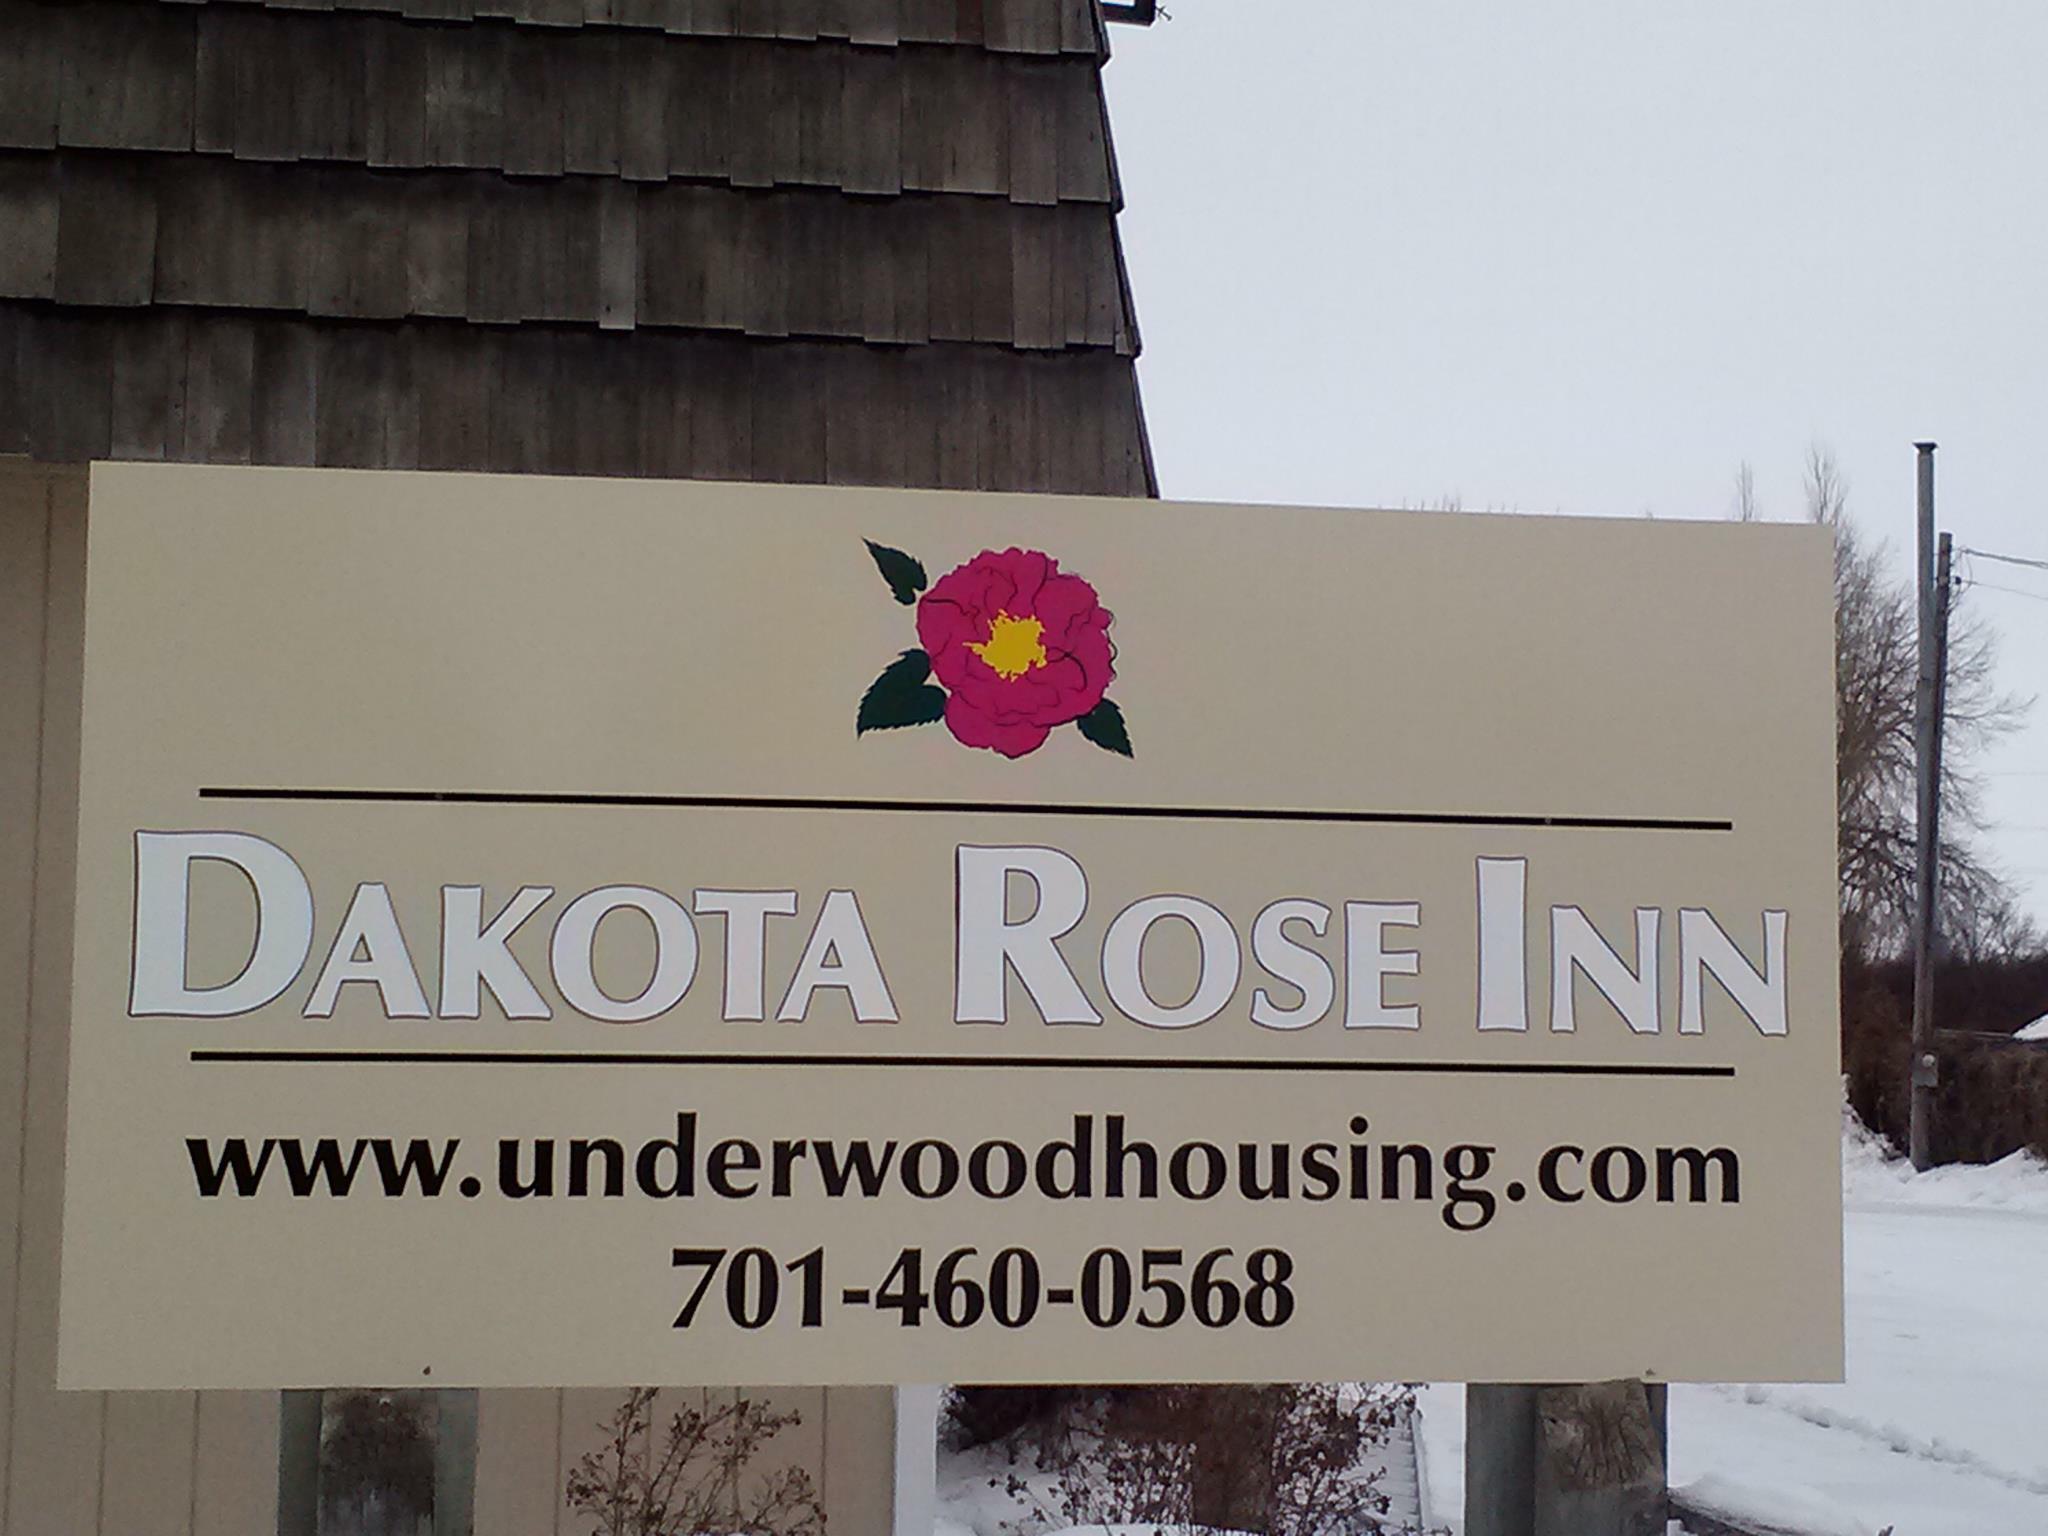 Dakota Rose Inn, Underwood ND